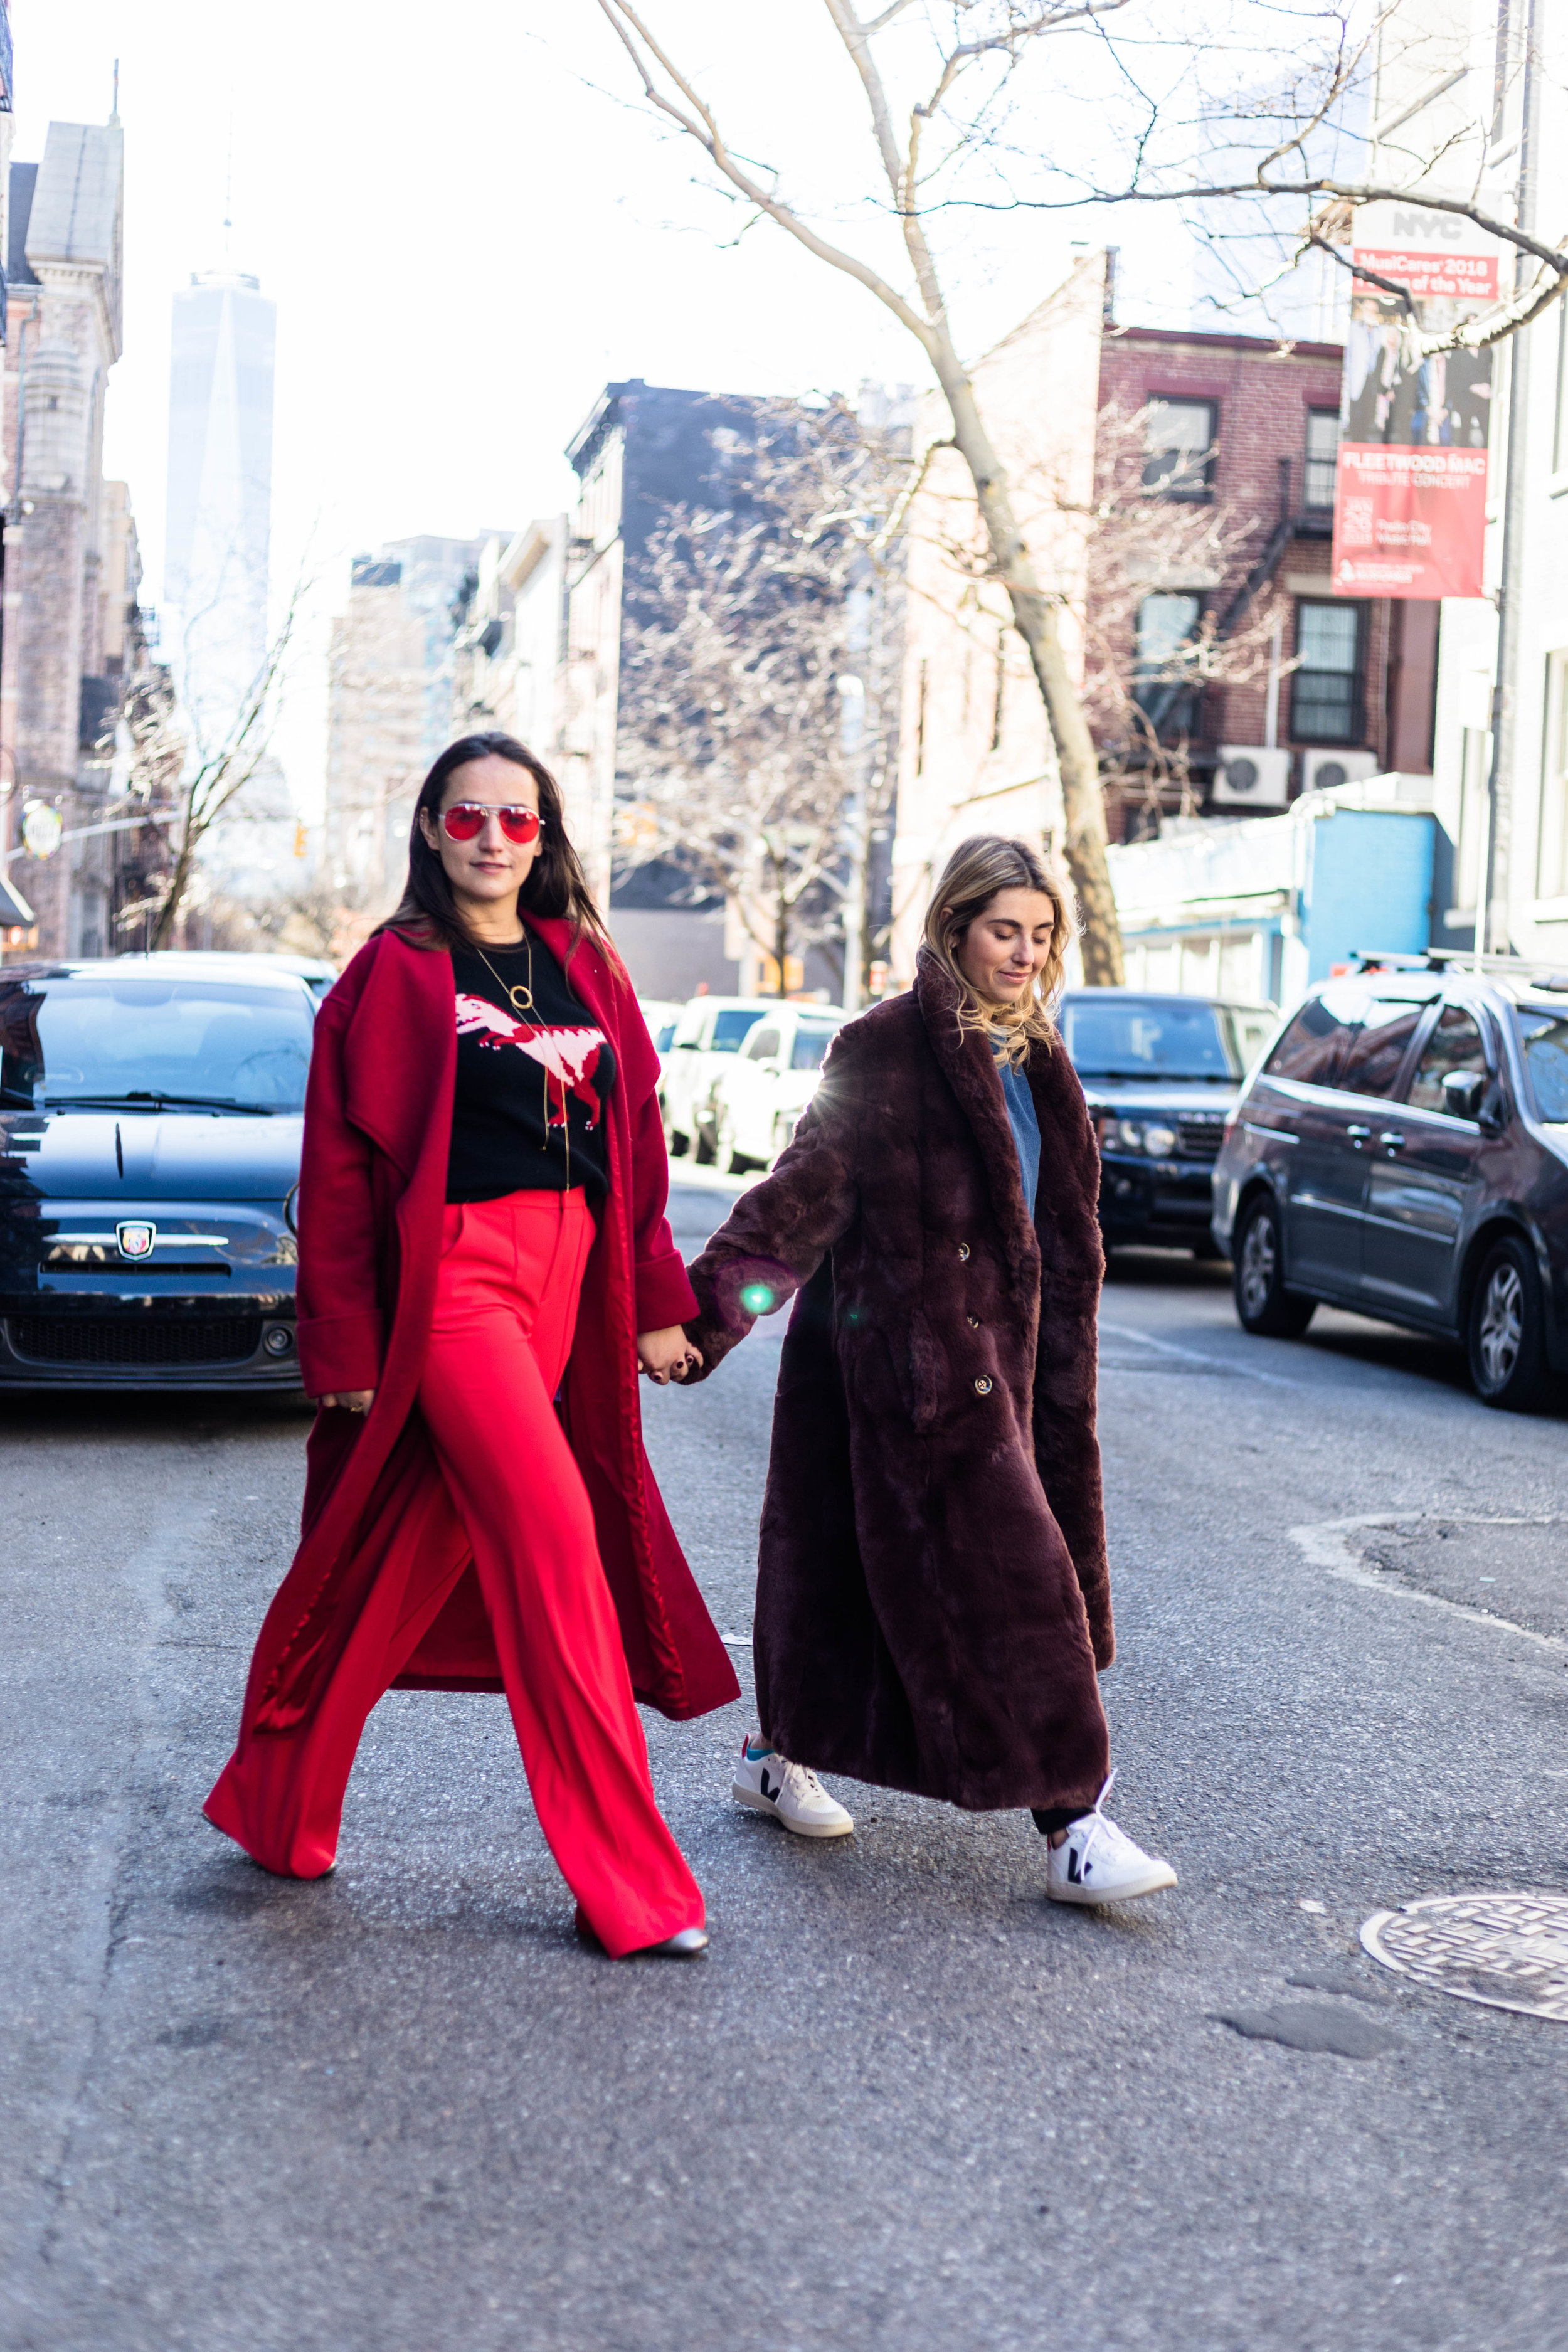 YIN 2MY YANG SOPHIE & CHARLOTTE BICKLEY BLOGGER SISTERS NYC LONG JACKET POST JANUARY 2018